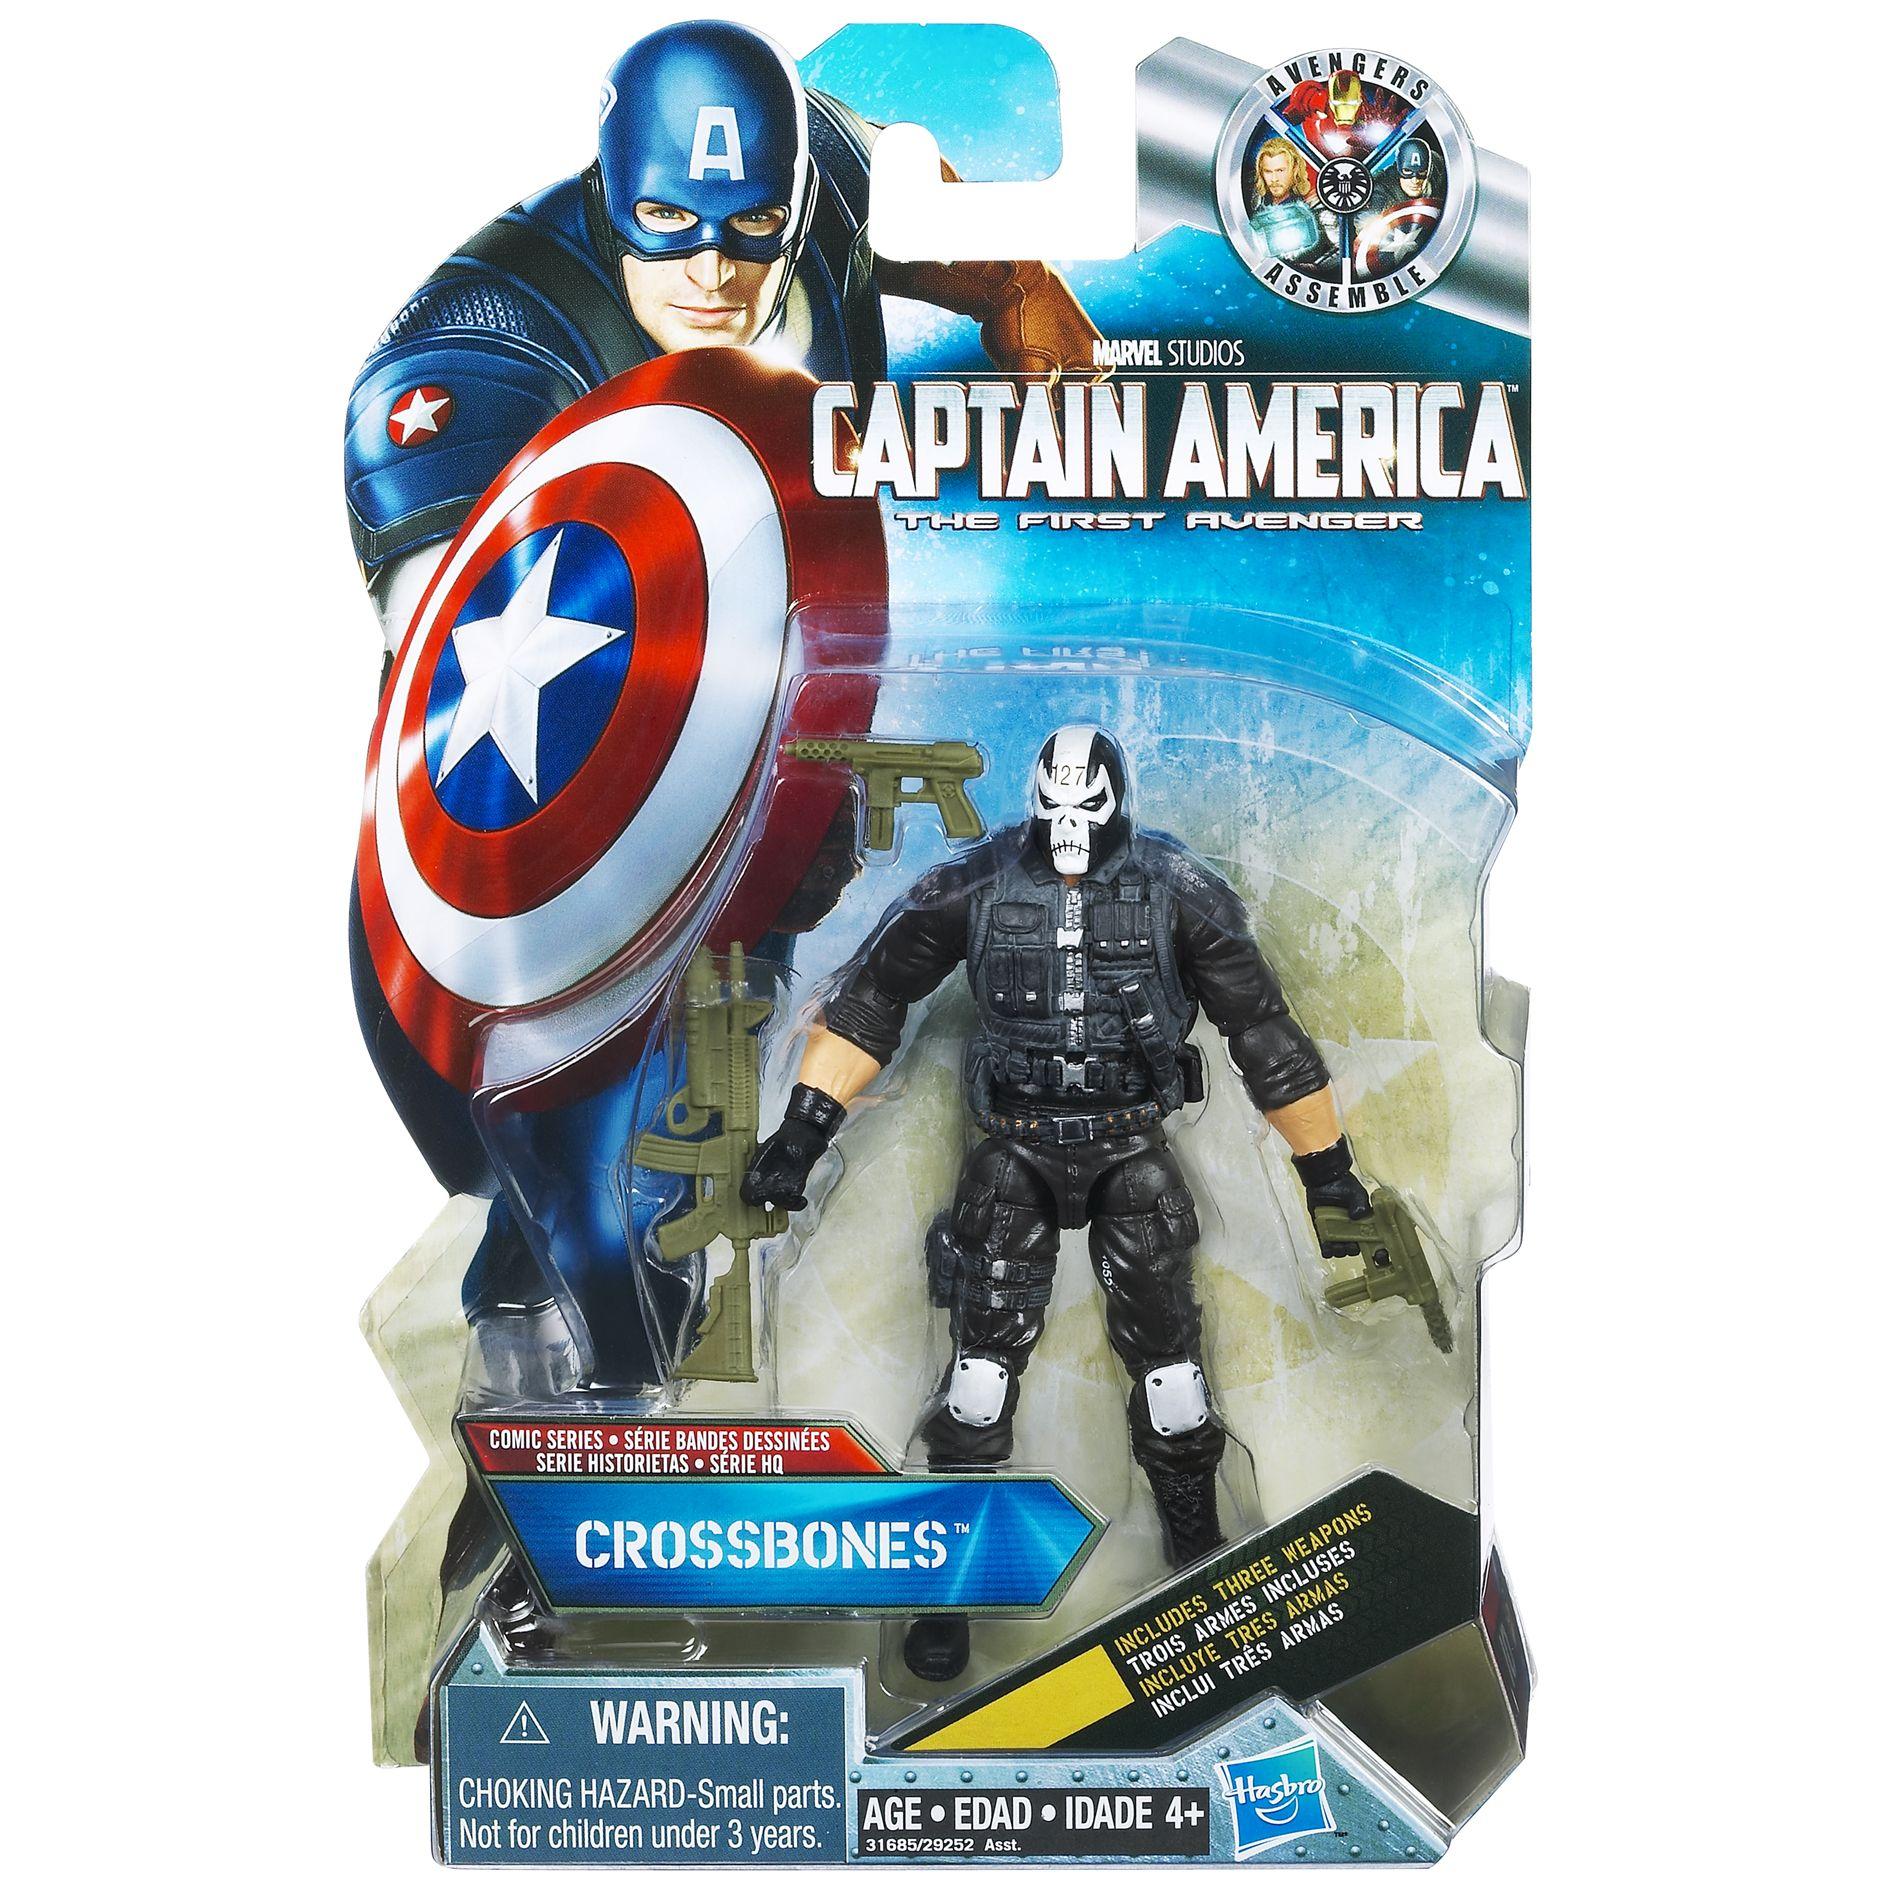 Disney Crossbones Marvel Captain America Action 3.75 Action Figure PartNumber: 004W003027446008P